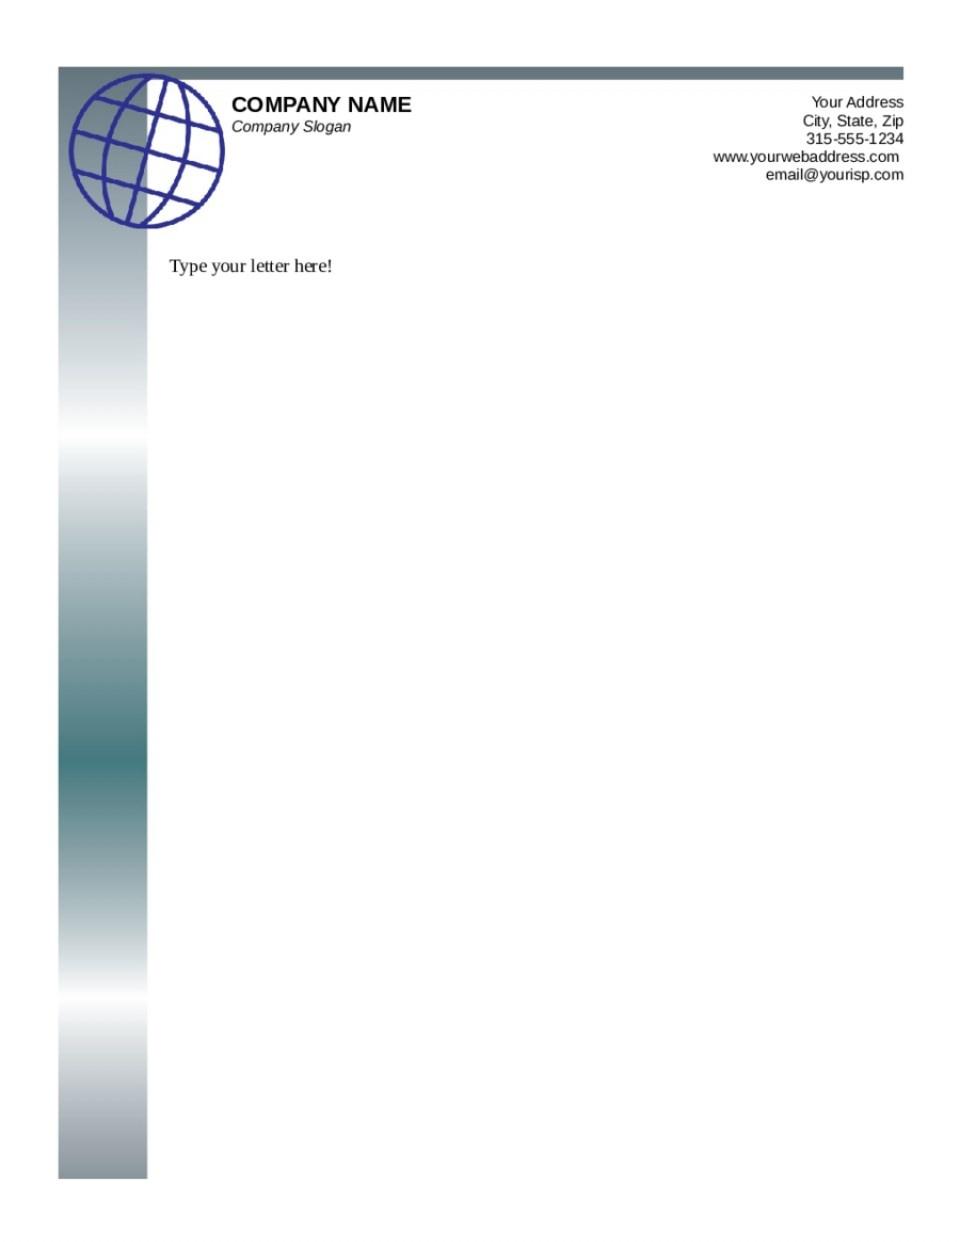 003 Free Printable Letterhead Templates Template Rare Ideas Business - Free Printable Letterhead Templates